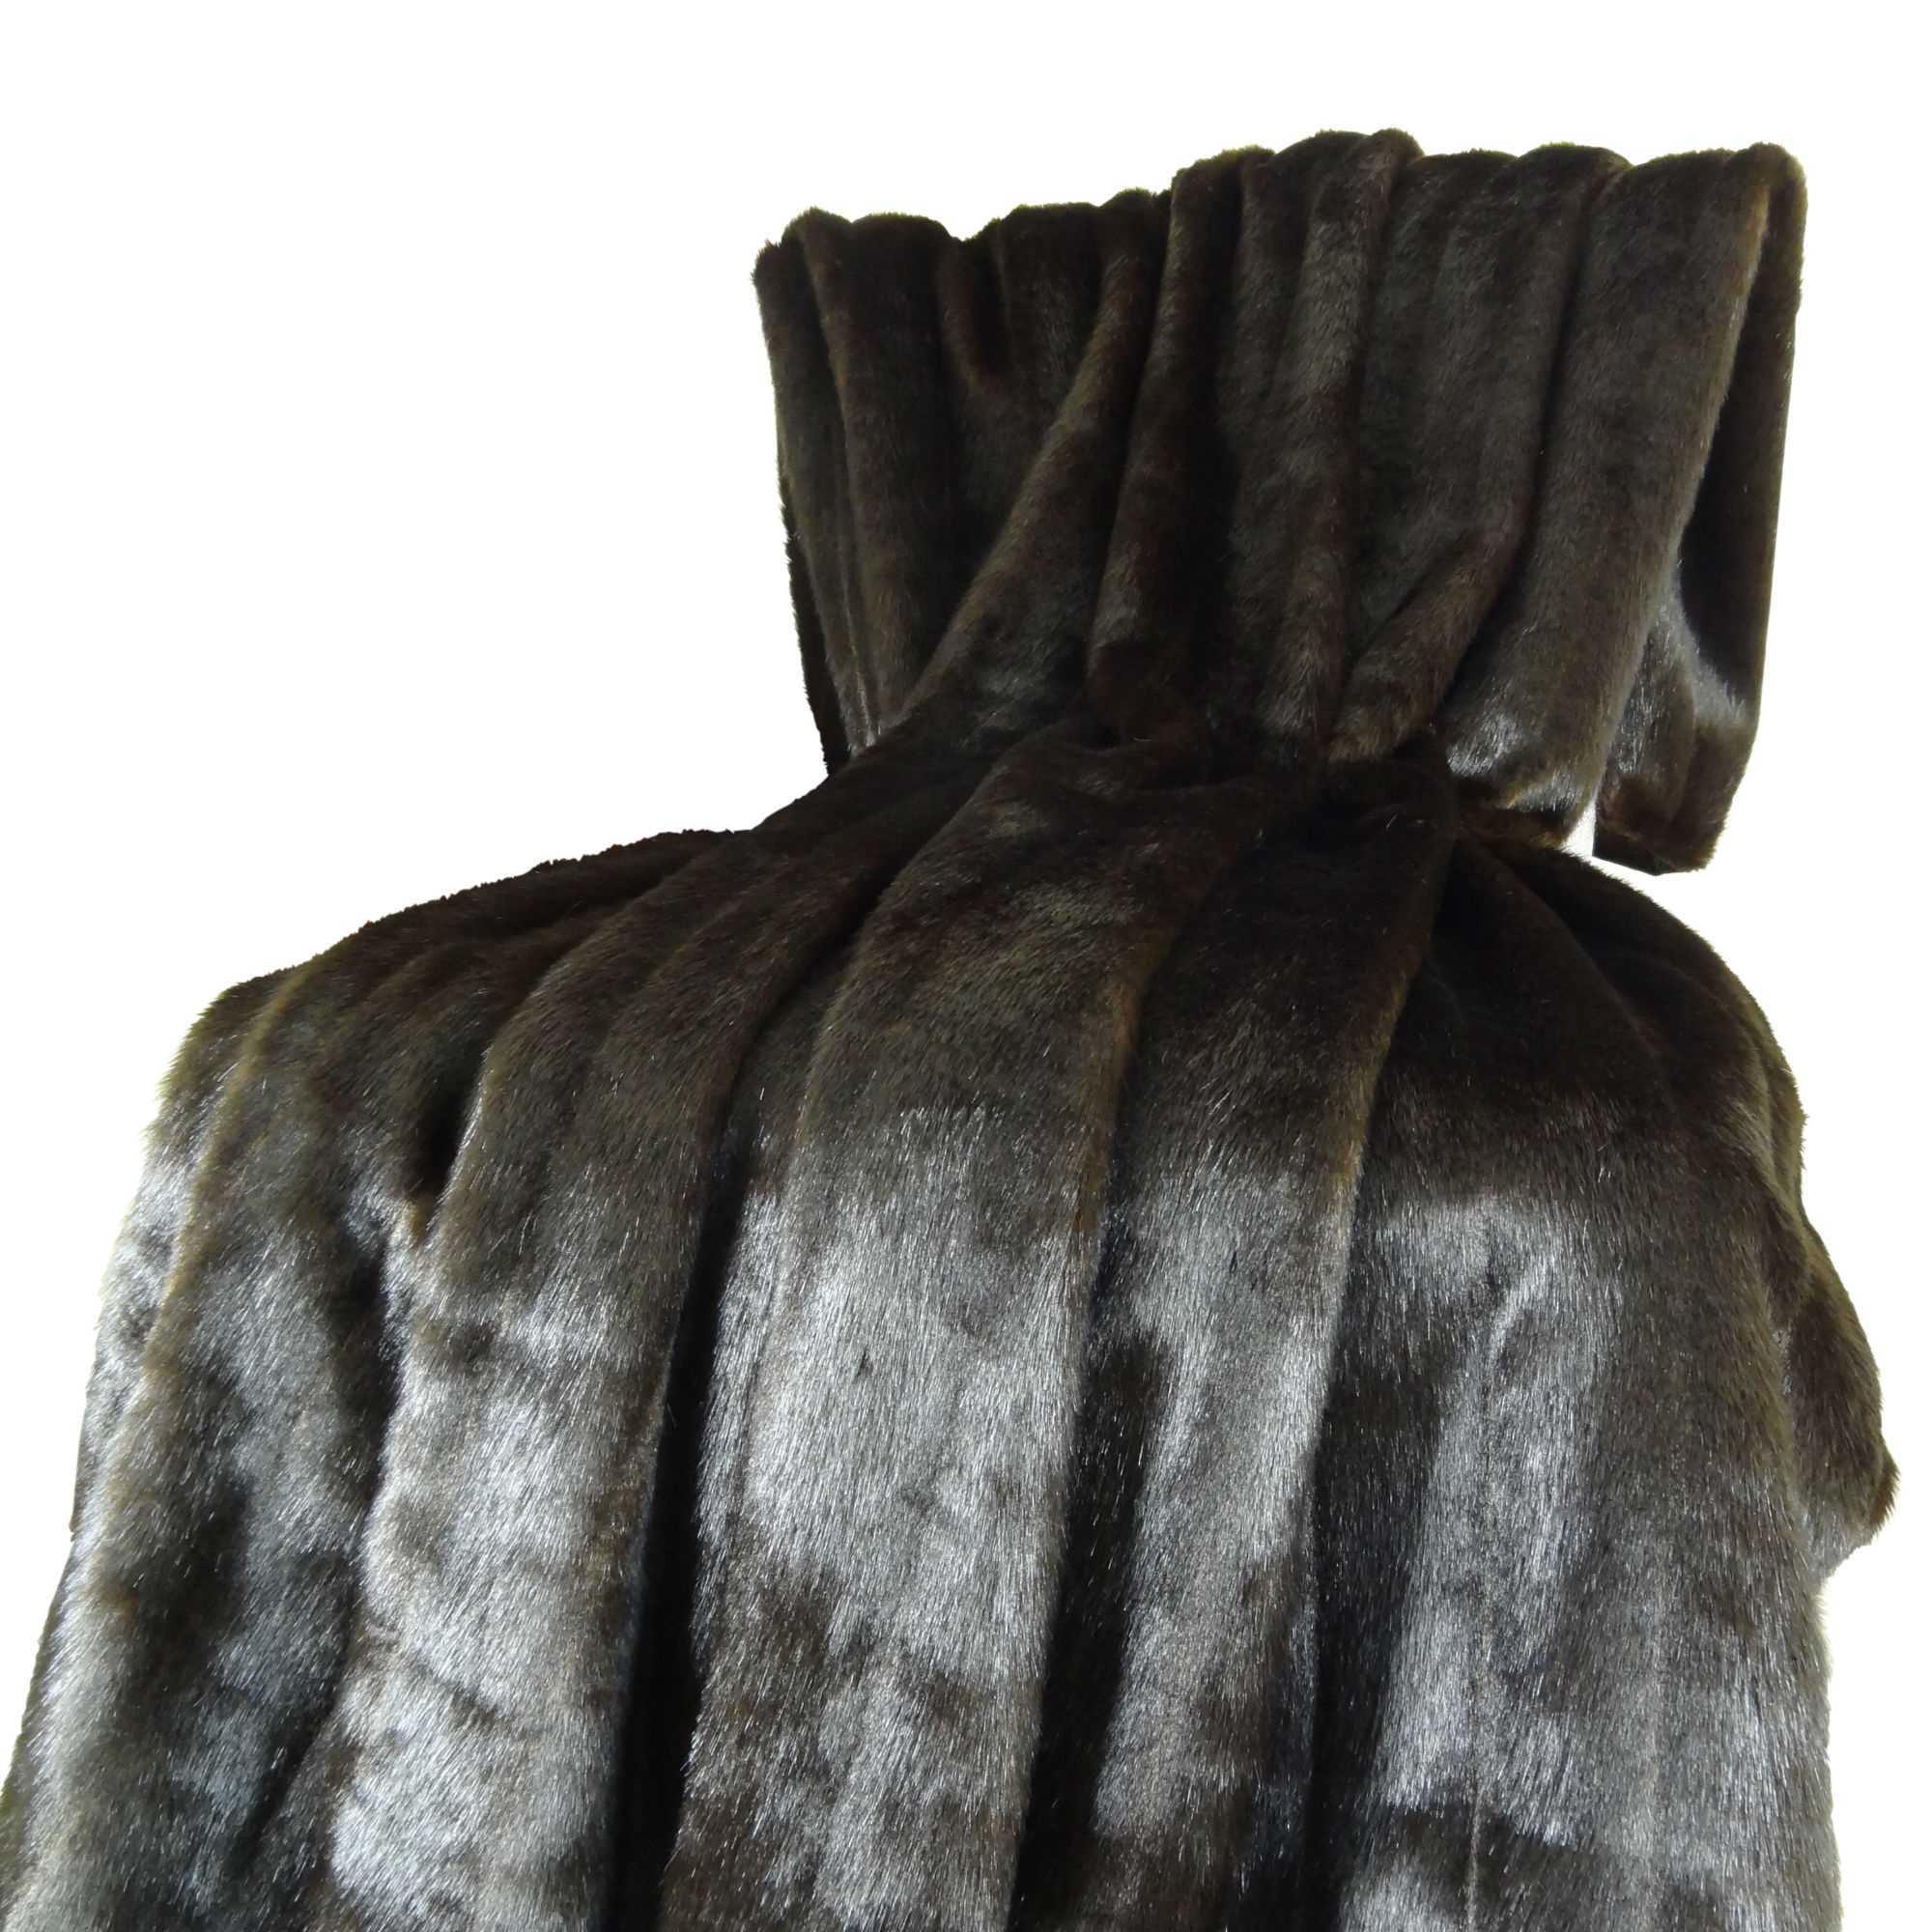 Plutus Tip Dyed Brown-Mink Handmade Throw